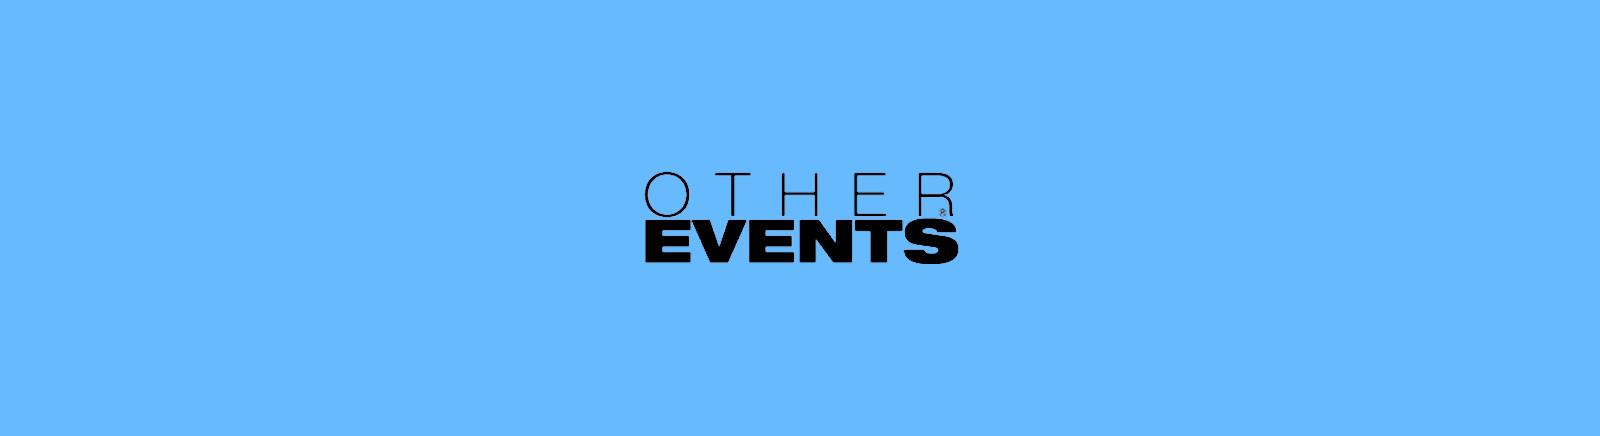 Juppen: Other Events Boots für Herren online shoppen